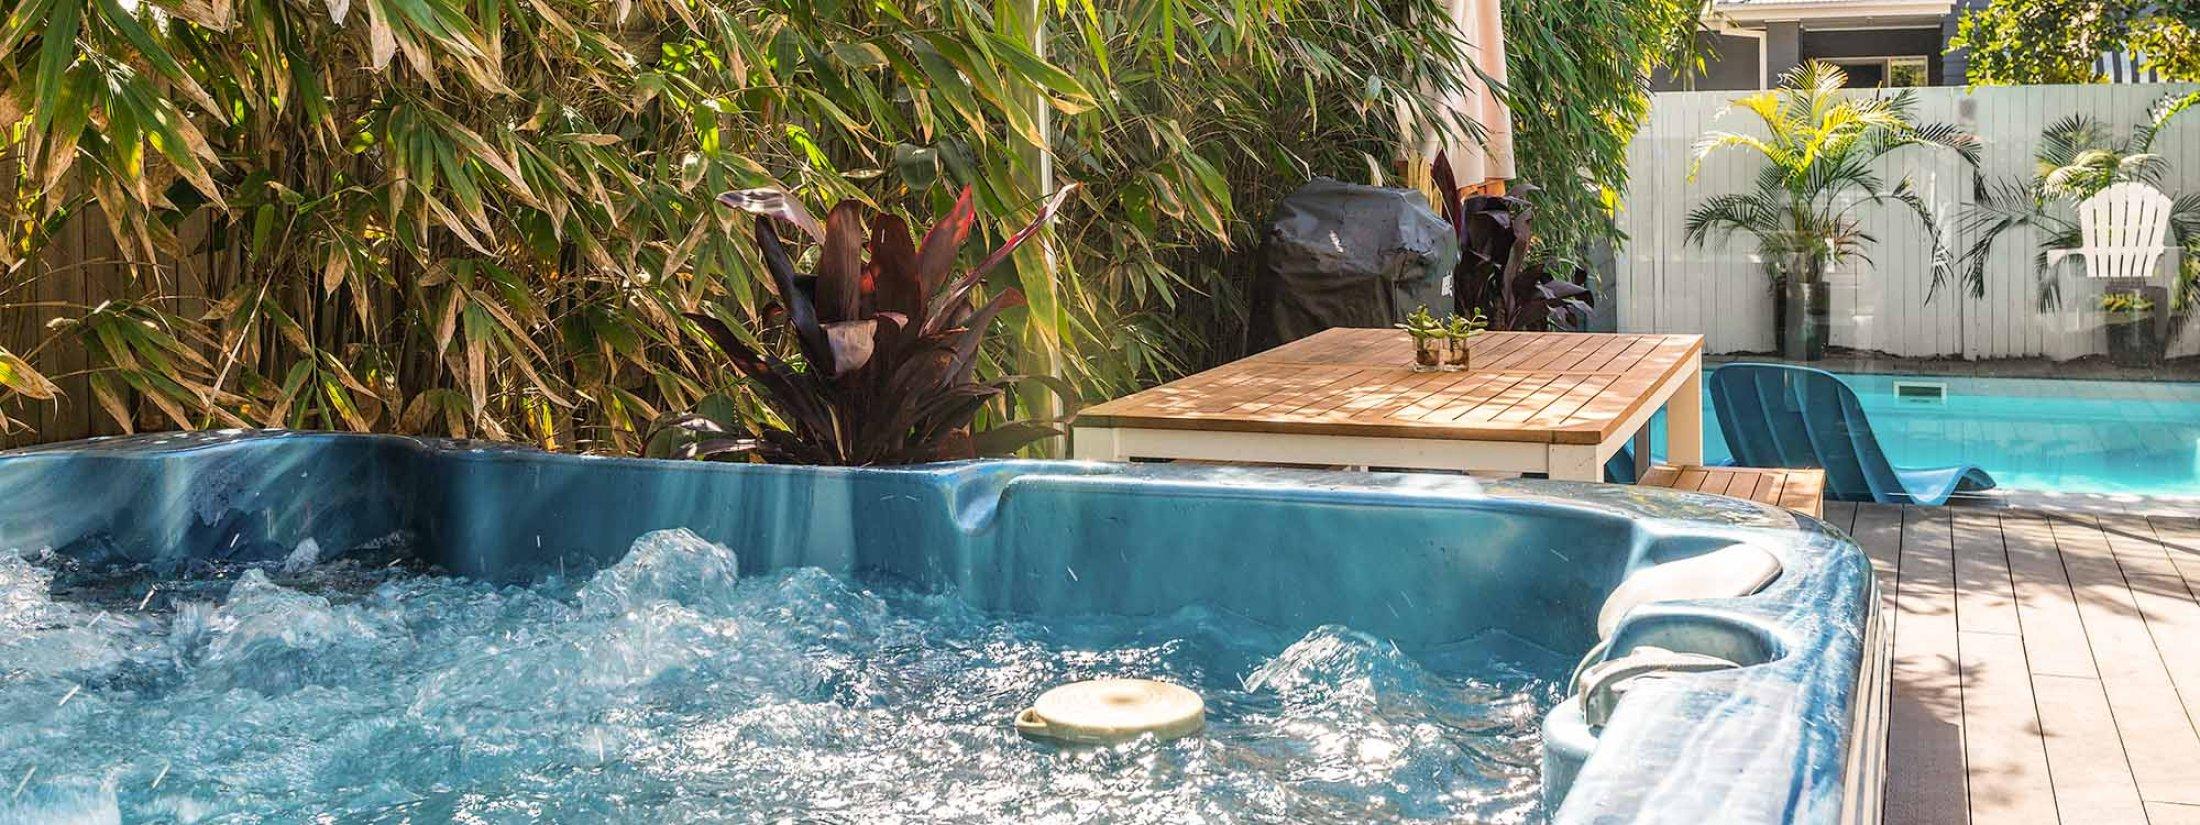 Aaloka Bay - Byron Bay - Spa and pool